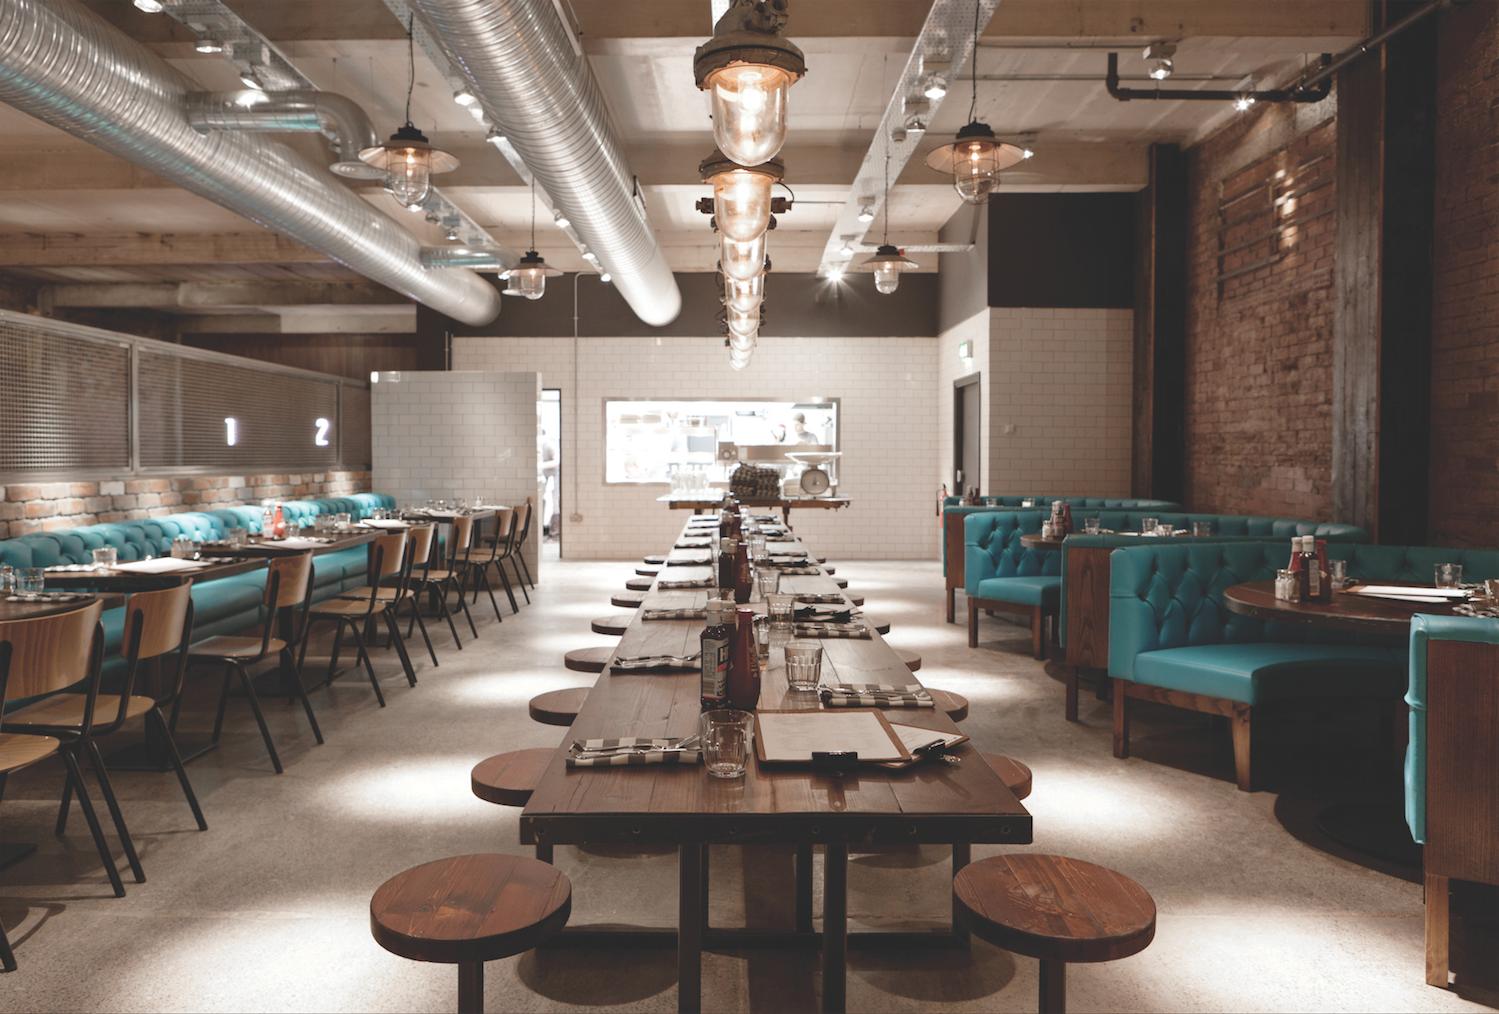 Indian restaurants interior design lane newcastle upon tyne uk  julie chambers design  restaurant